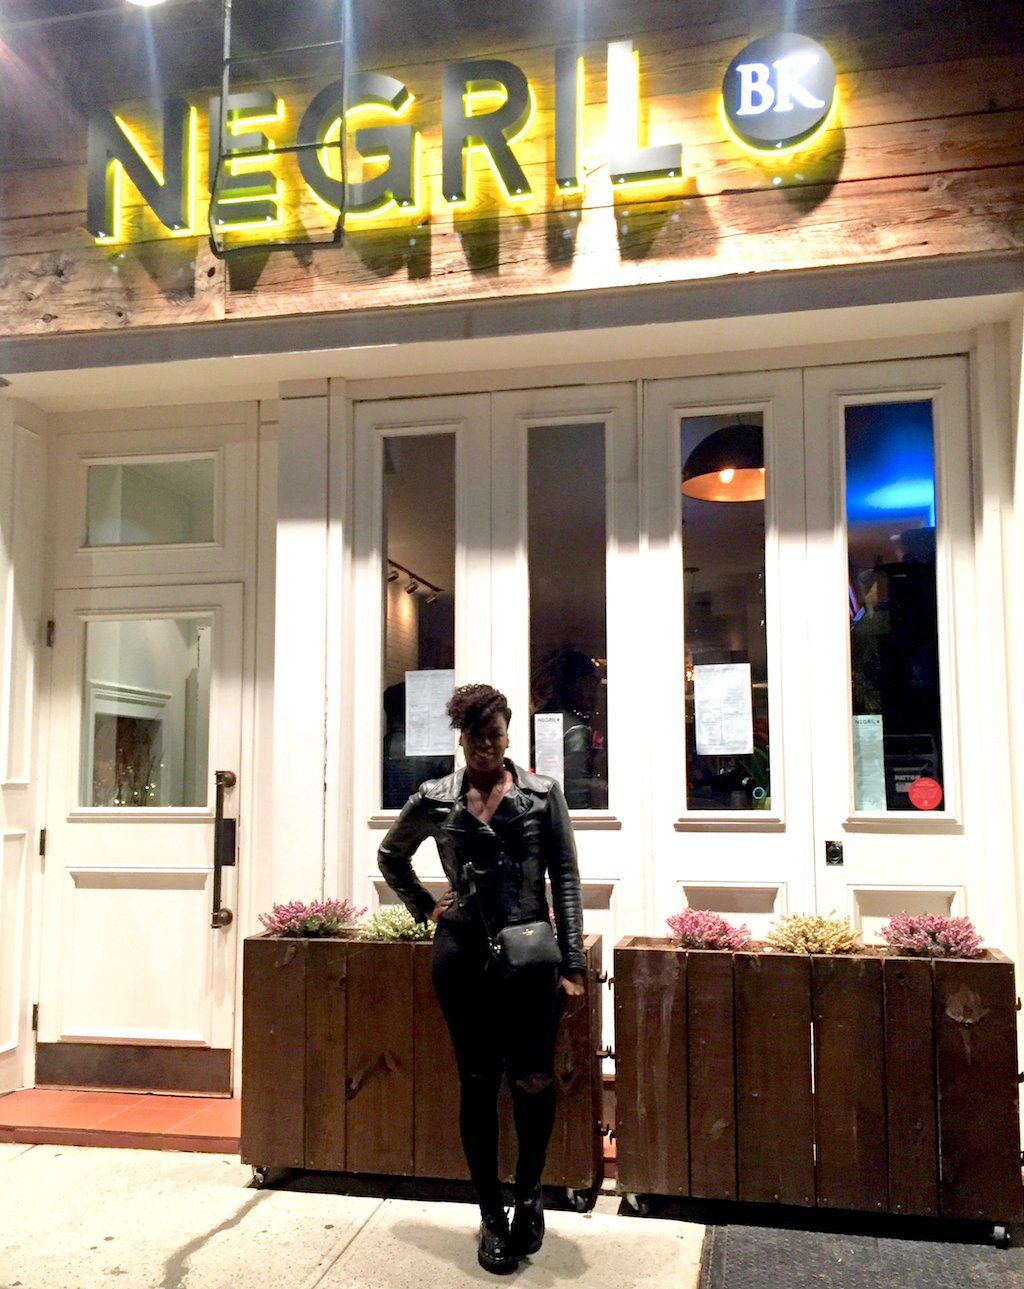 Negril BK Review